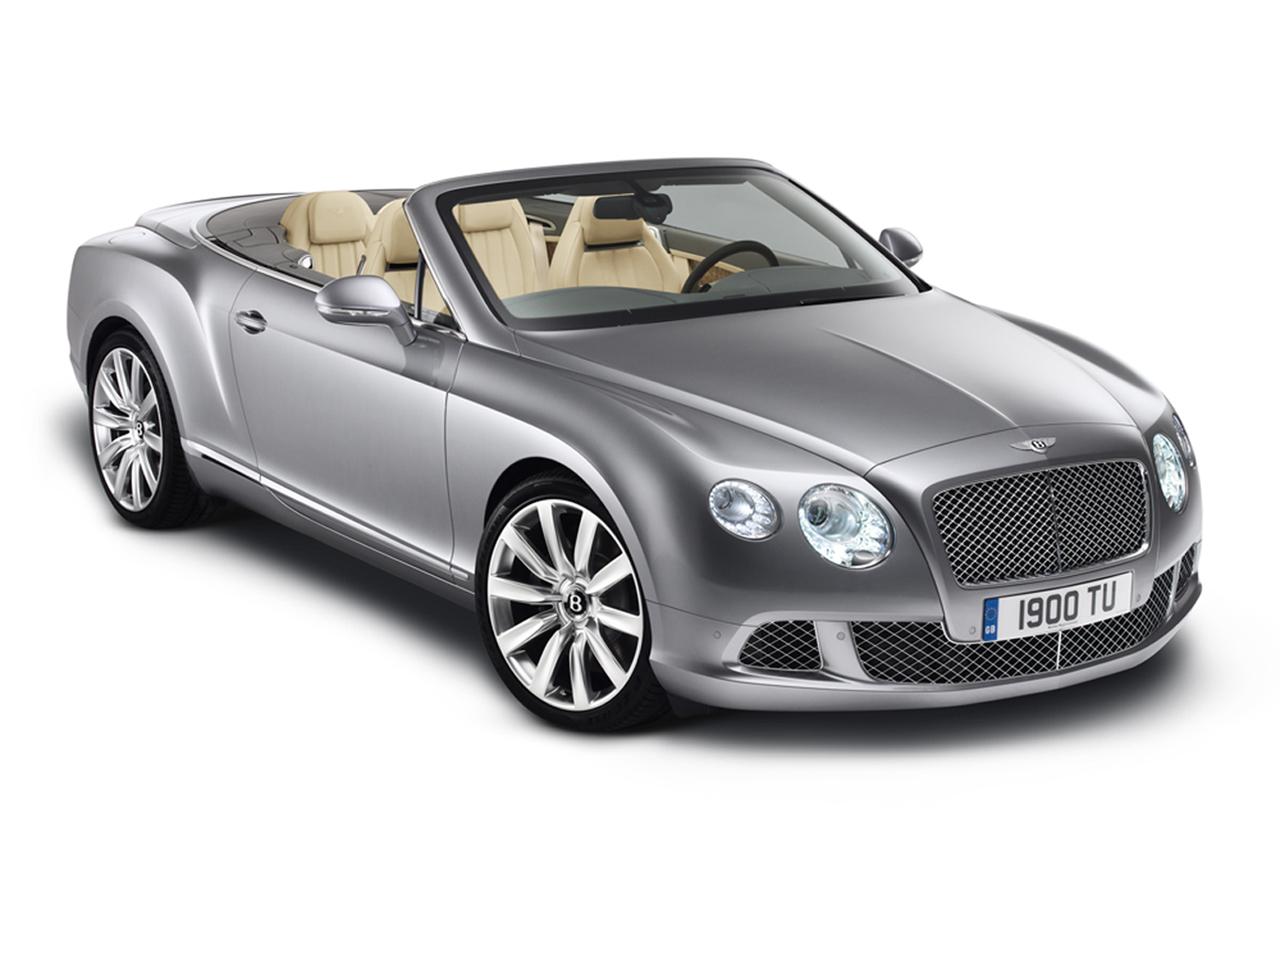 Abramos la capota: Bentley Continental GTC 2012 | Motor digital